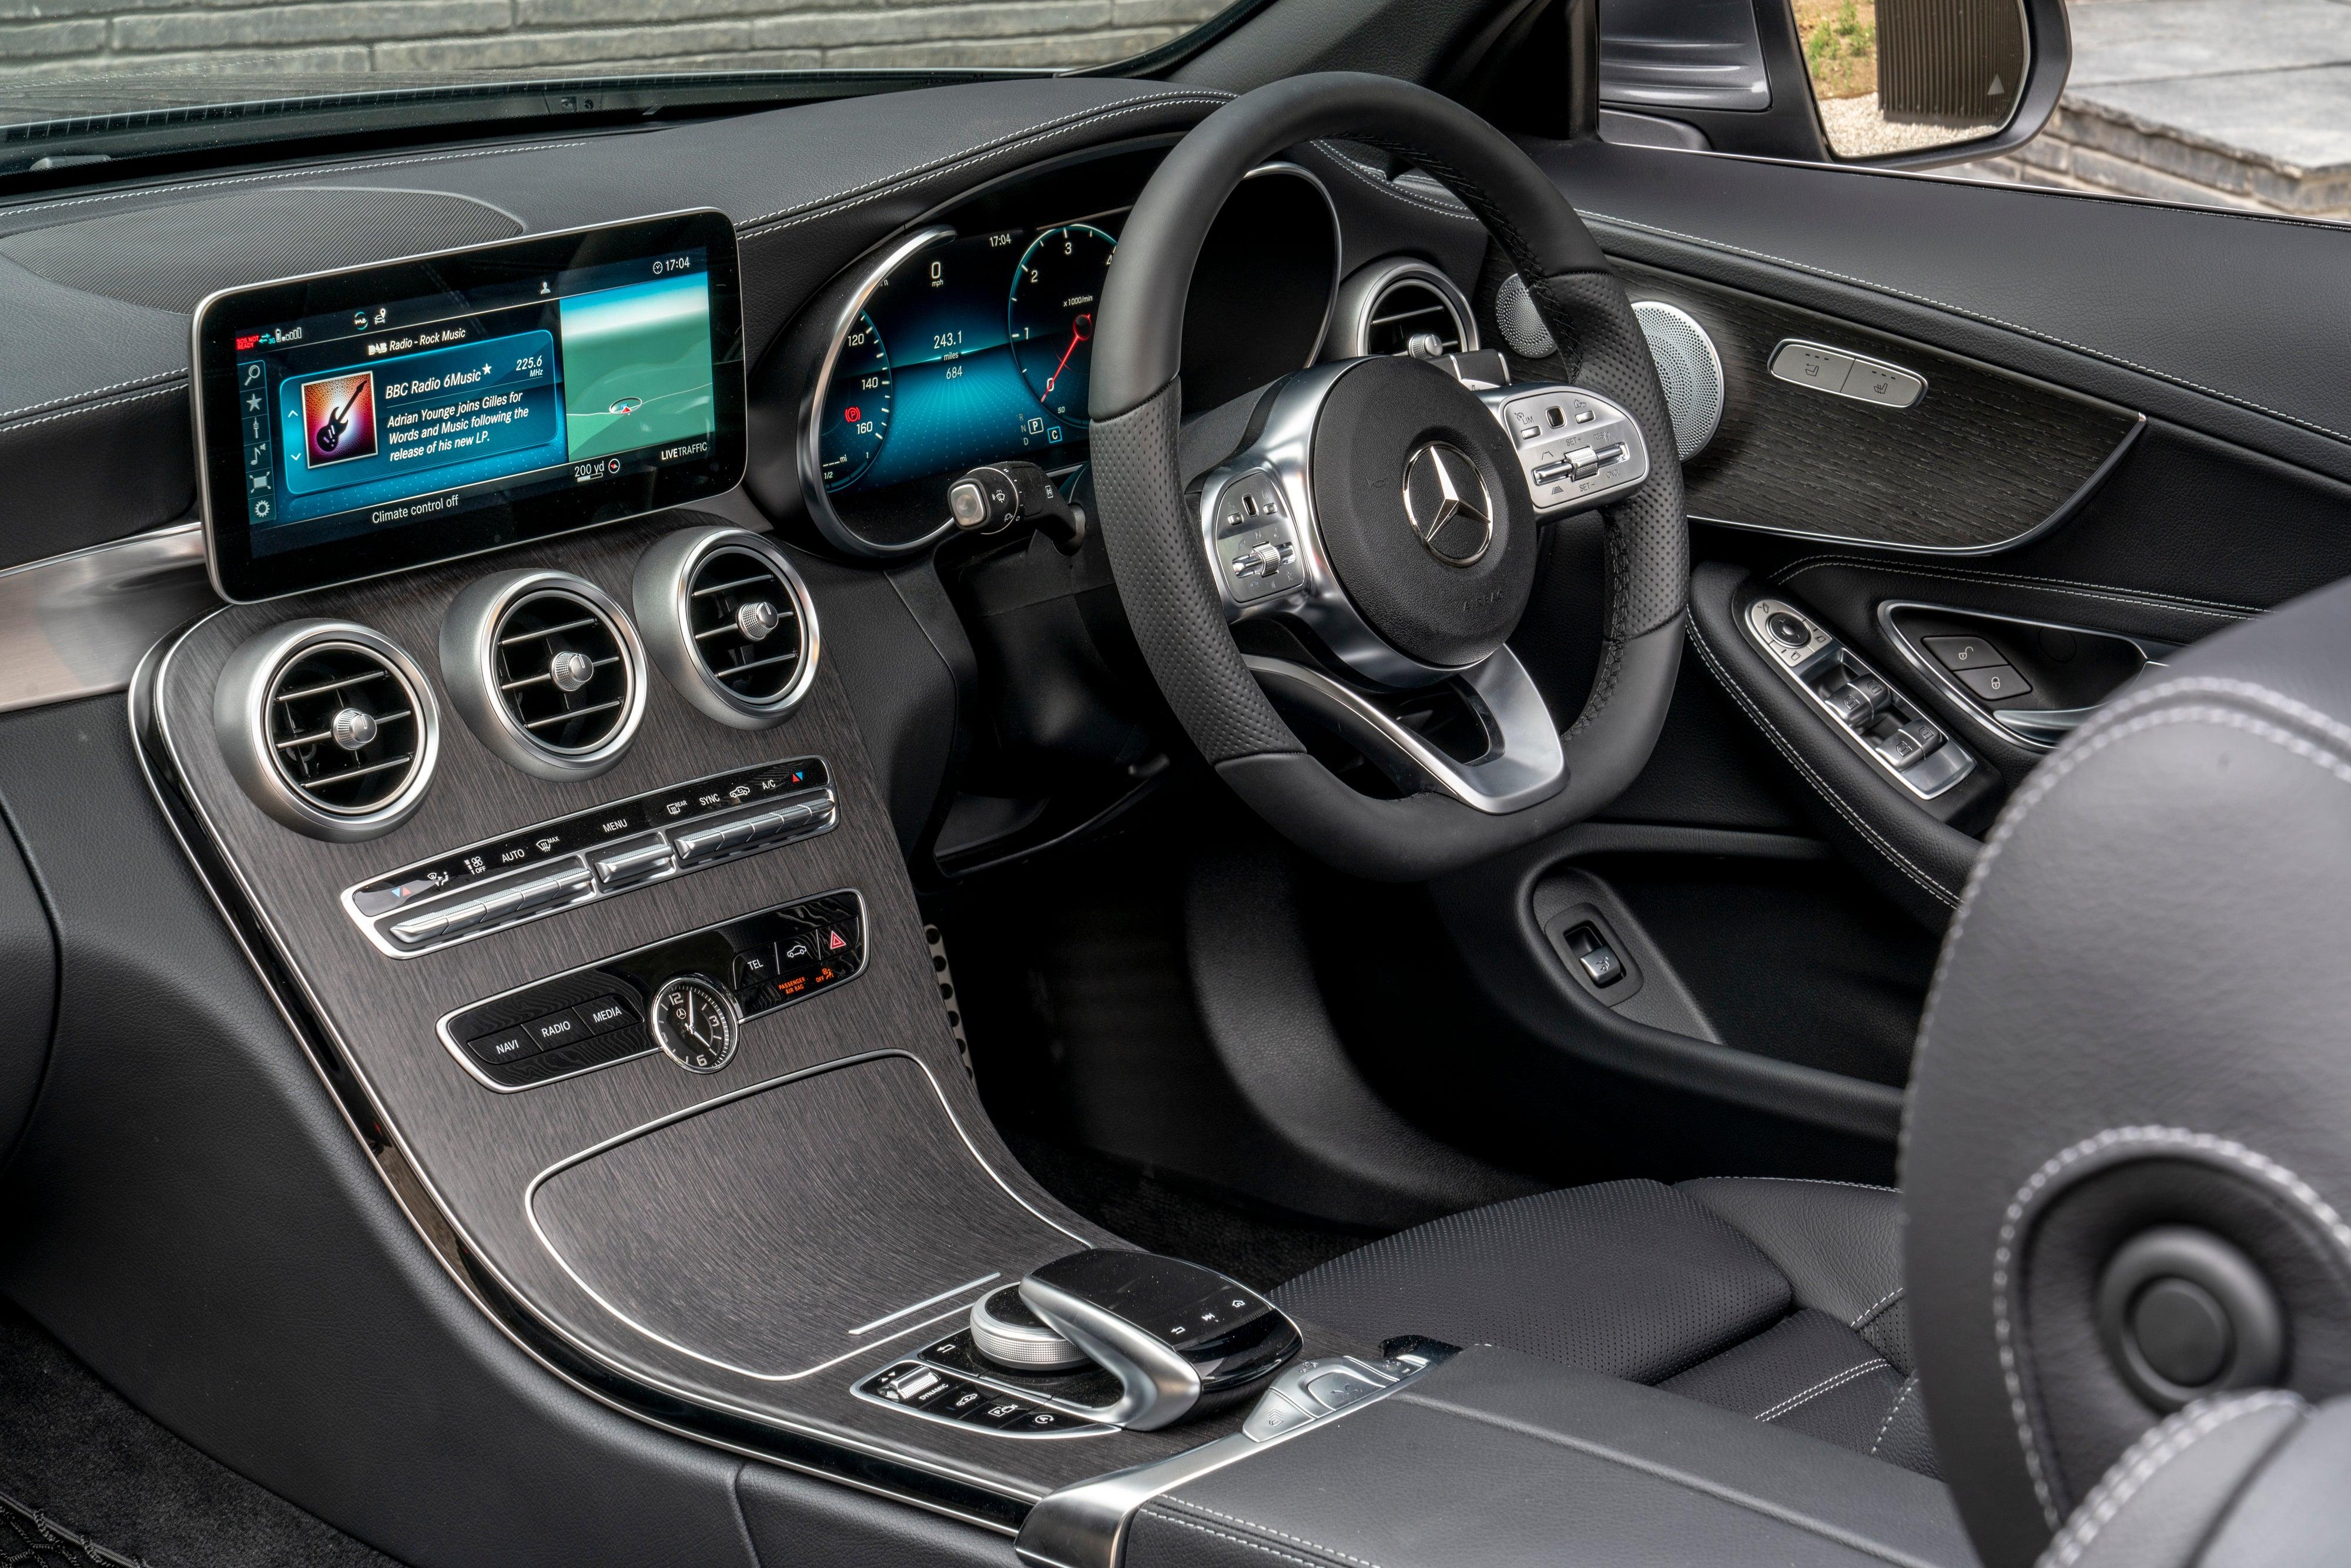 Mercedes C-Class Cabriolet front interior